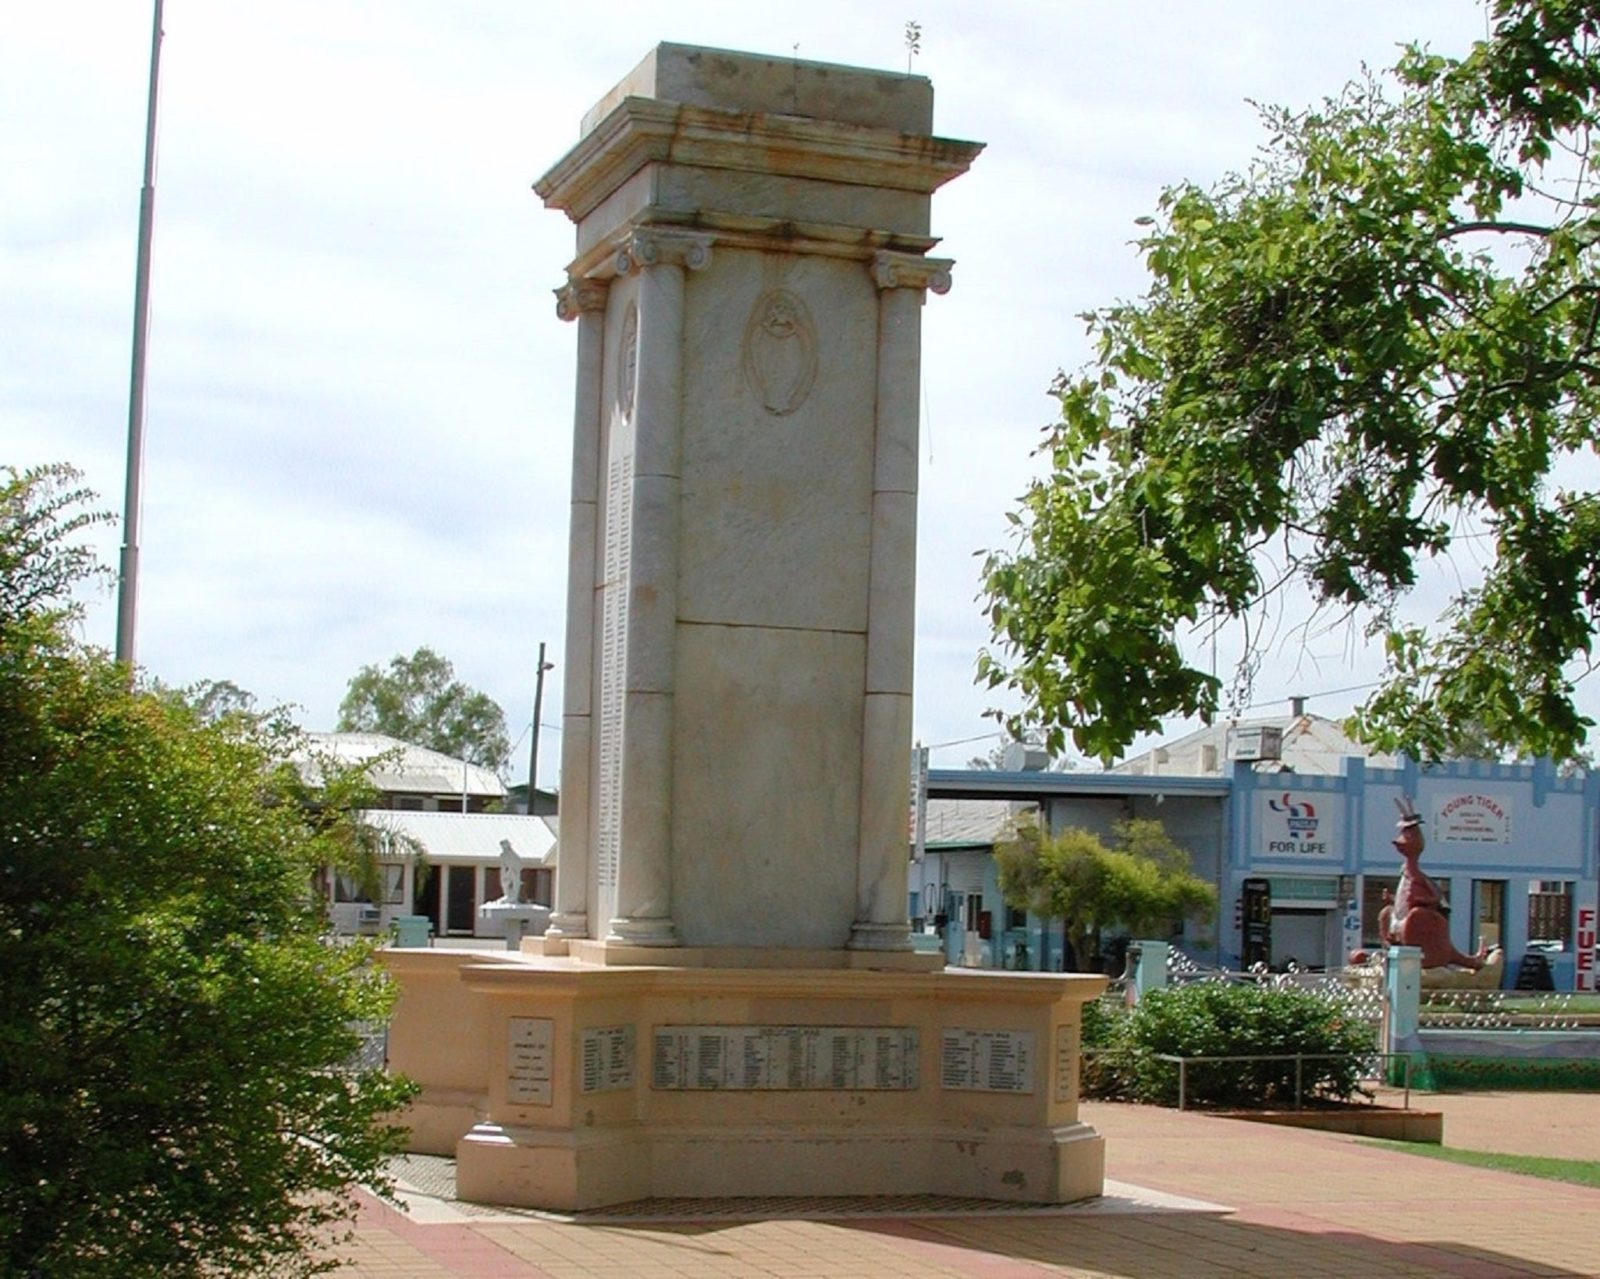 Charleville War Memorial